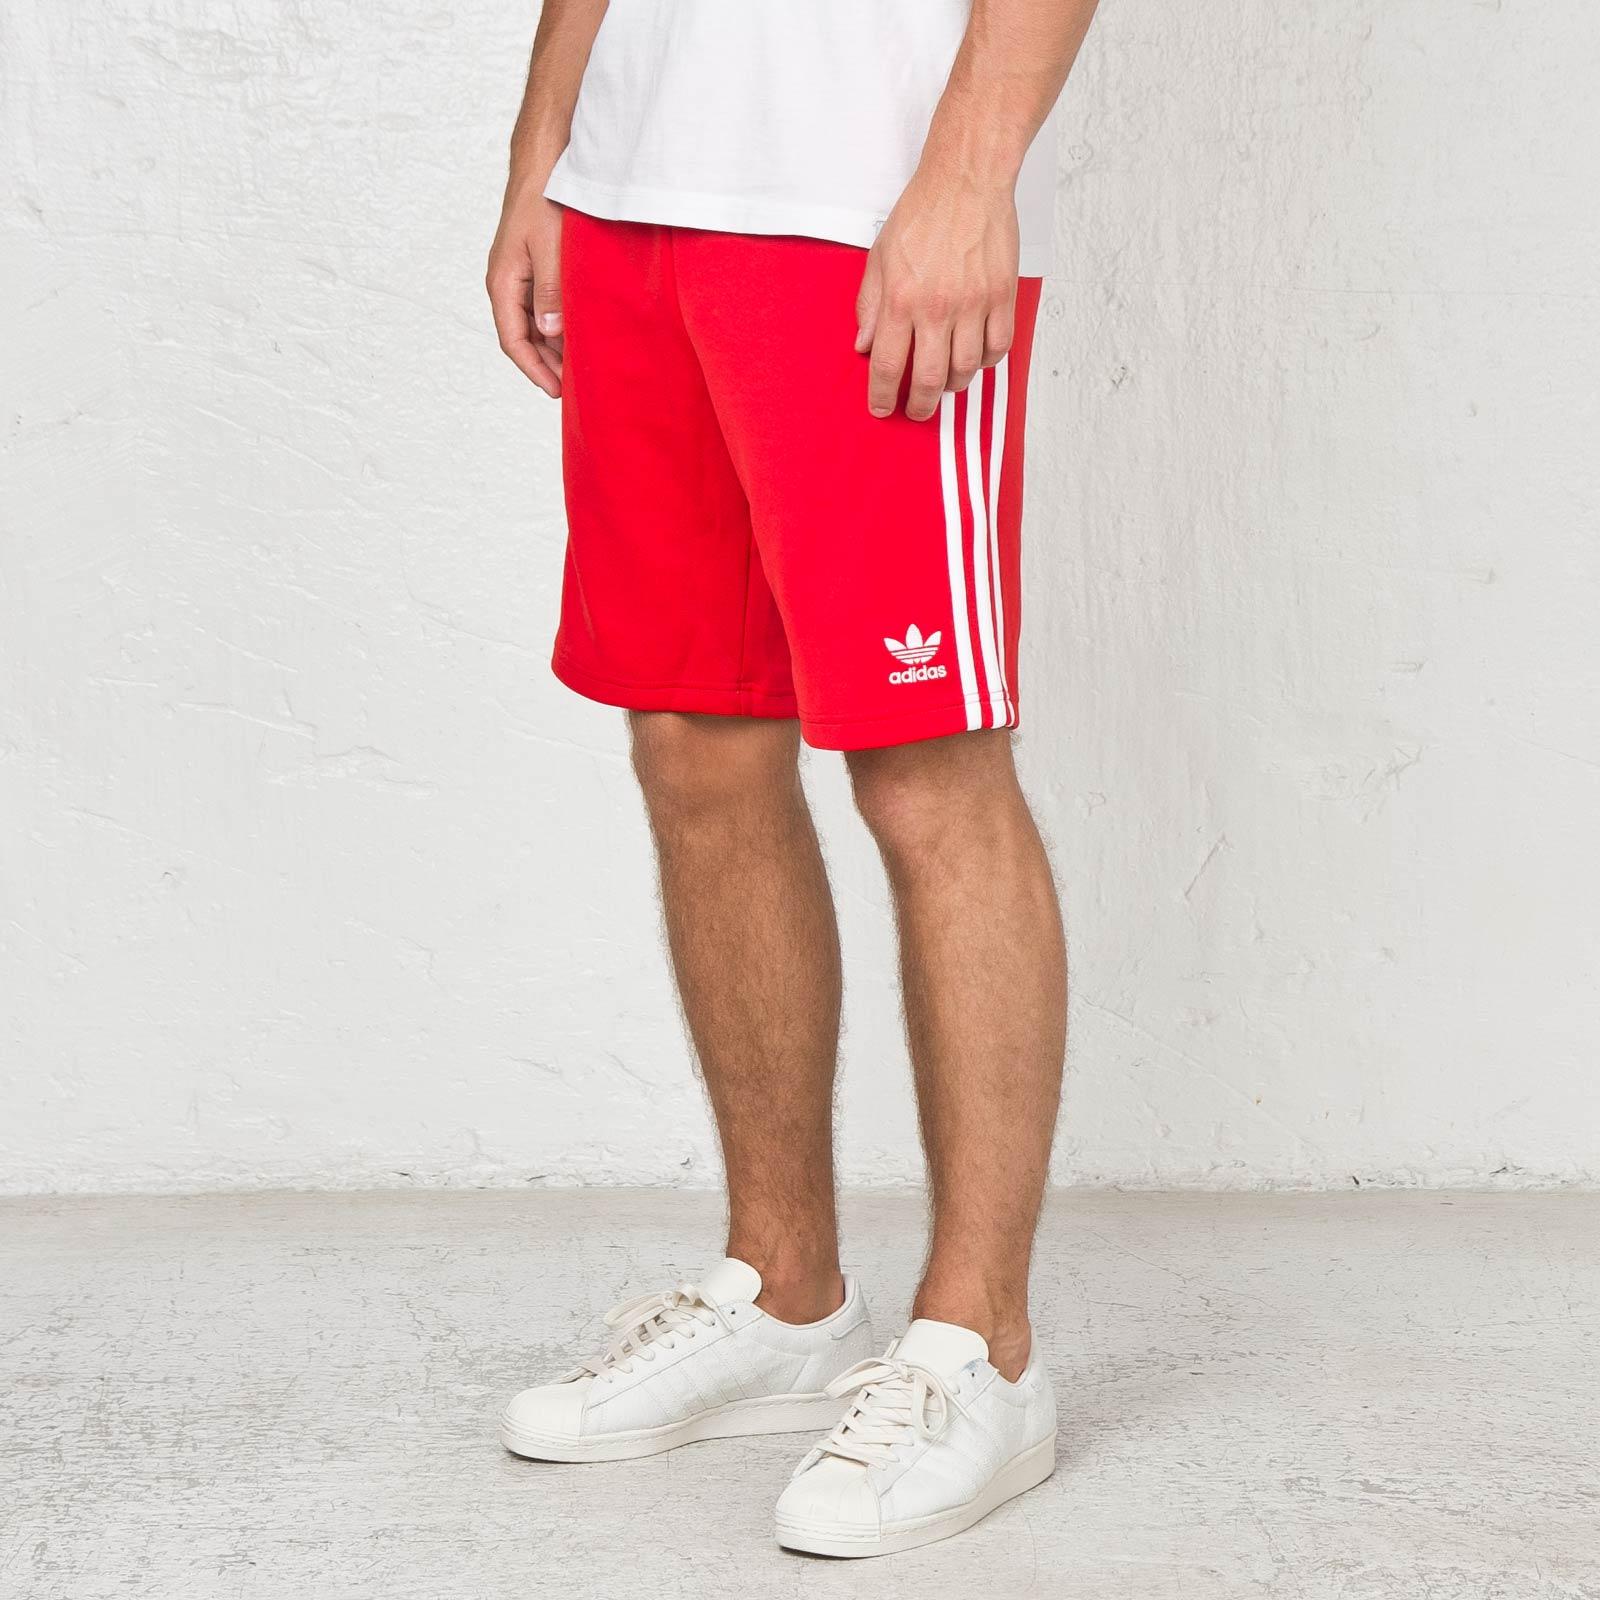 Adidas Aa1398 SneakersnstuffSneakers Short Superstar Adidas tQCshxdBr